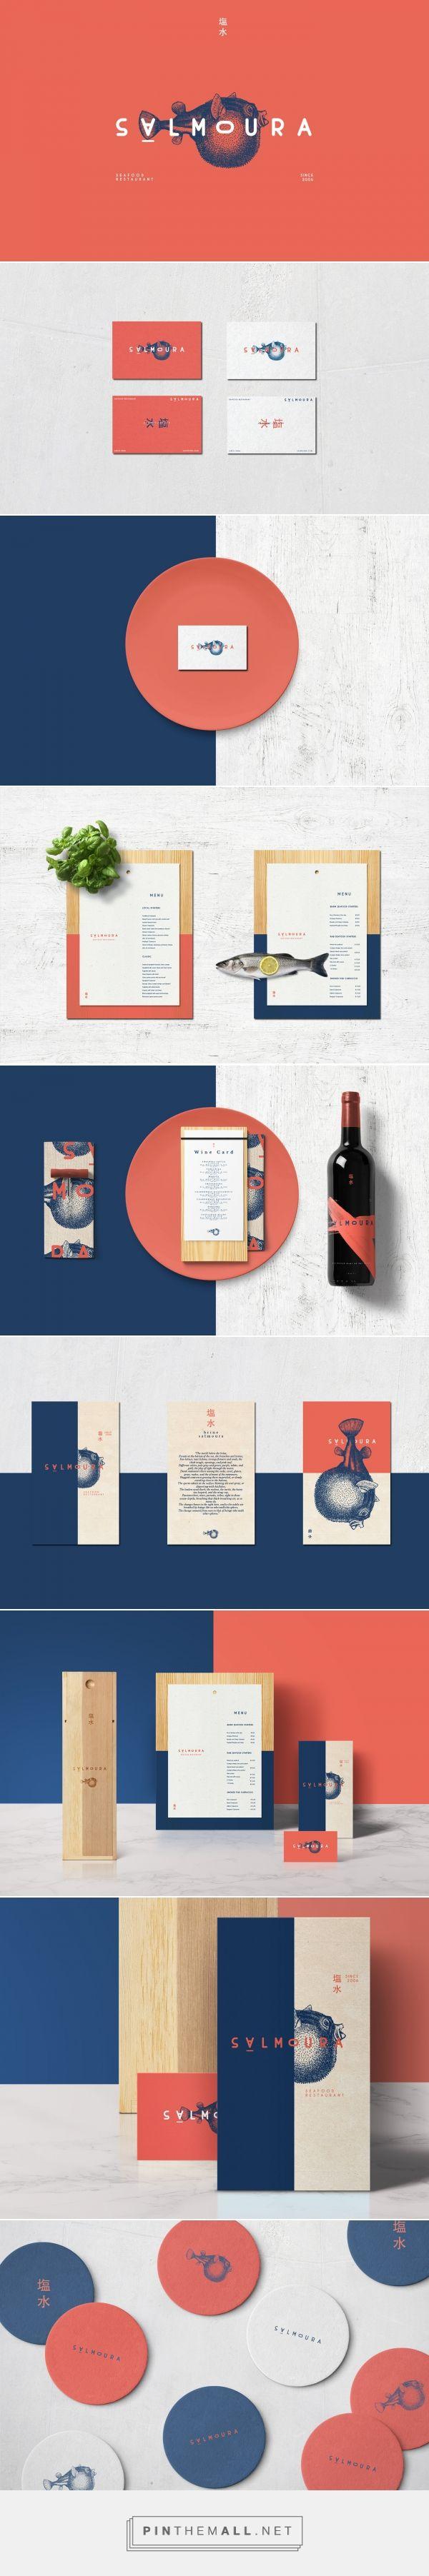 Salmoura Seafood Restaurant Branding and Menu Design by Manoela Silva | Fivestar Branding Agency – Design and Branding Agency & Curated Inspiration Gallery